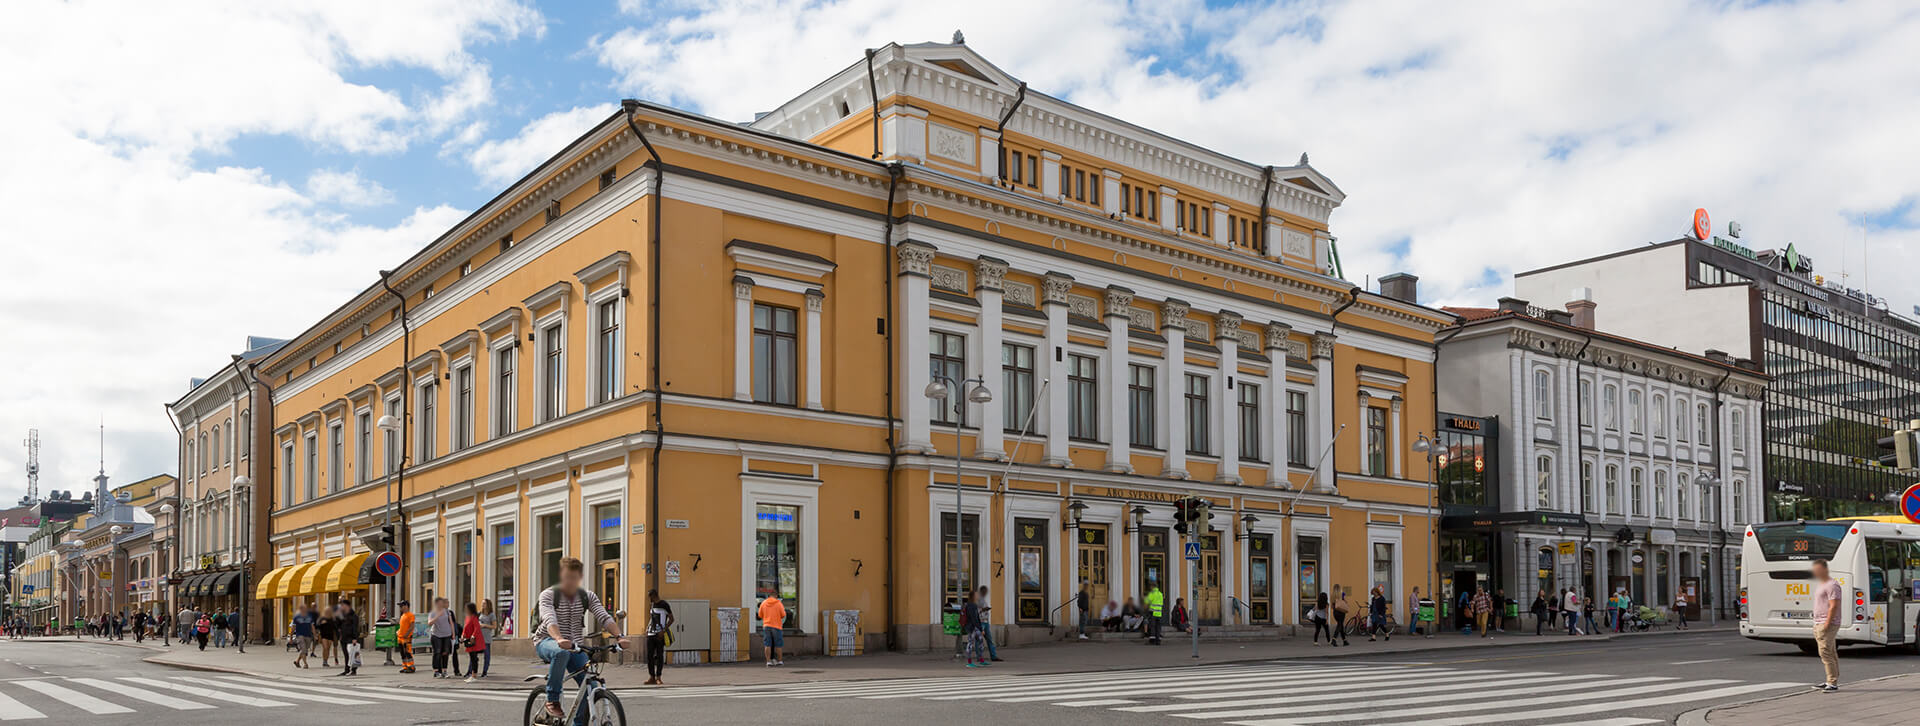 abo-svenska-teater-2